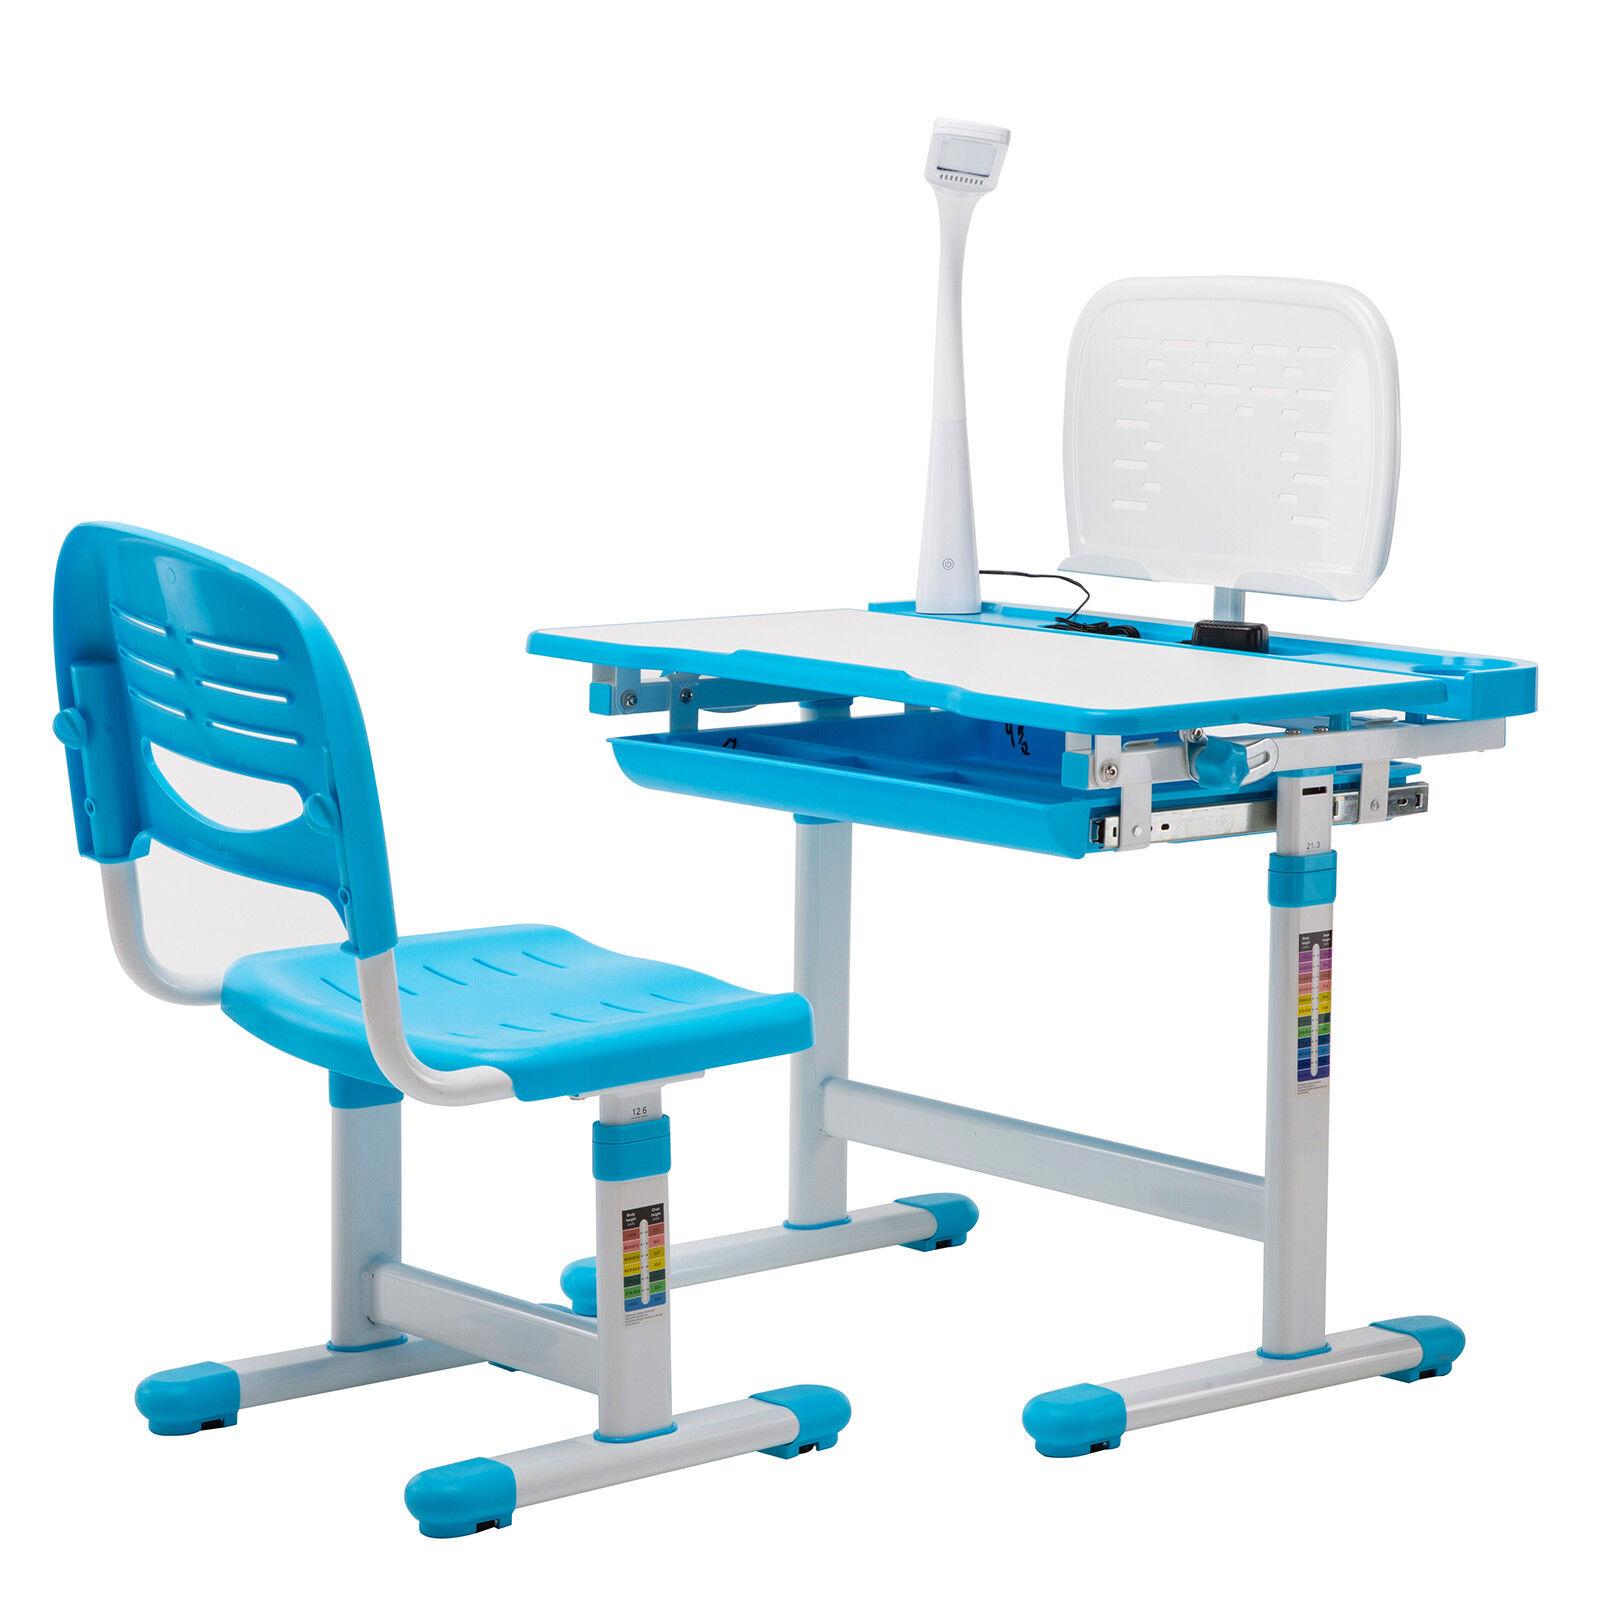 Details About Blue Adjustable Children S Study Desk Chair Set Child Kids Table W Desk Led Lamp